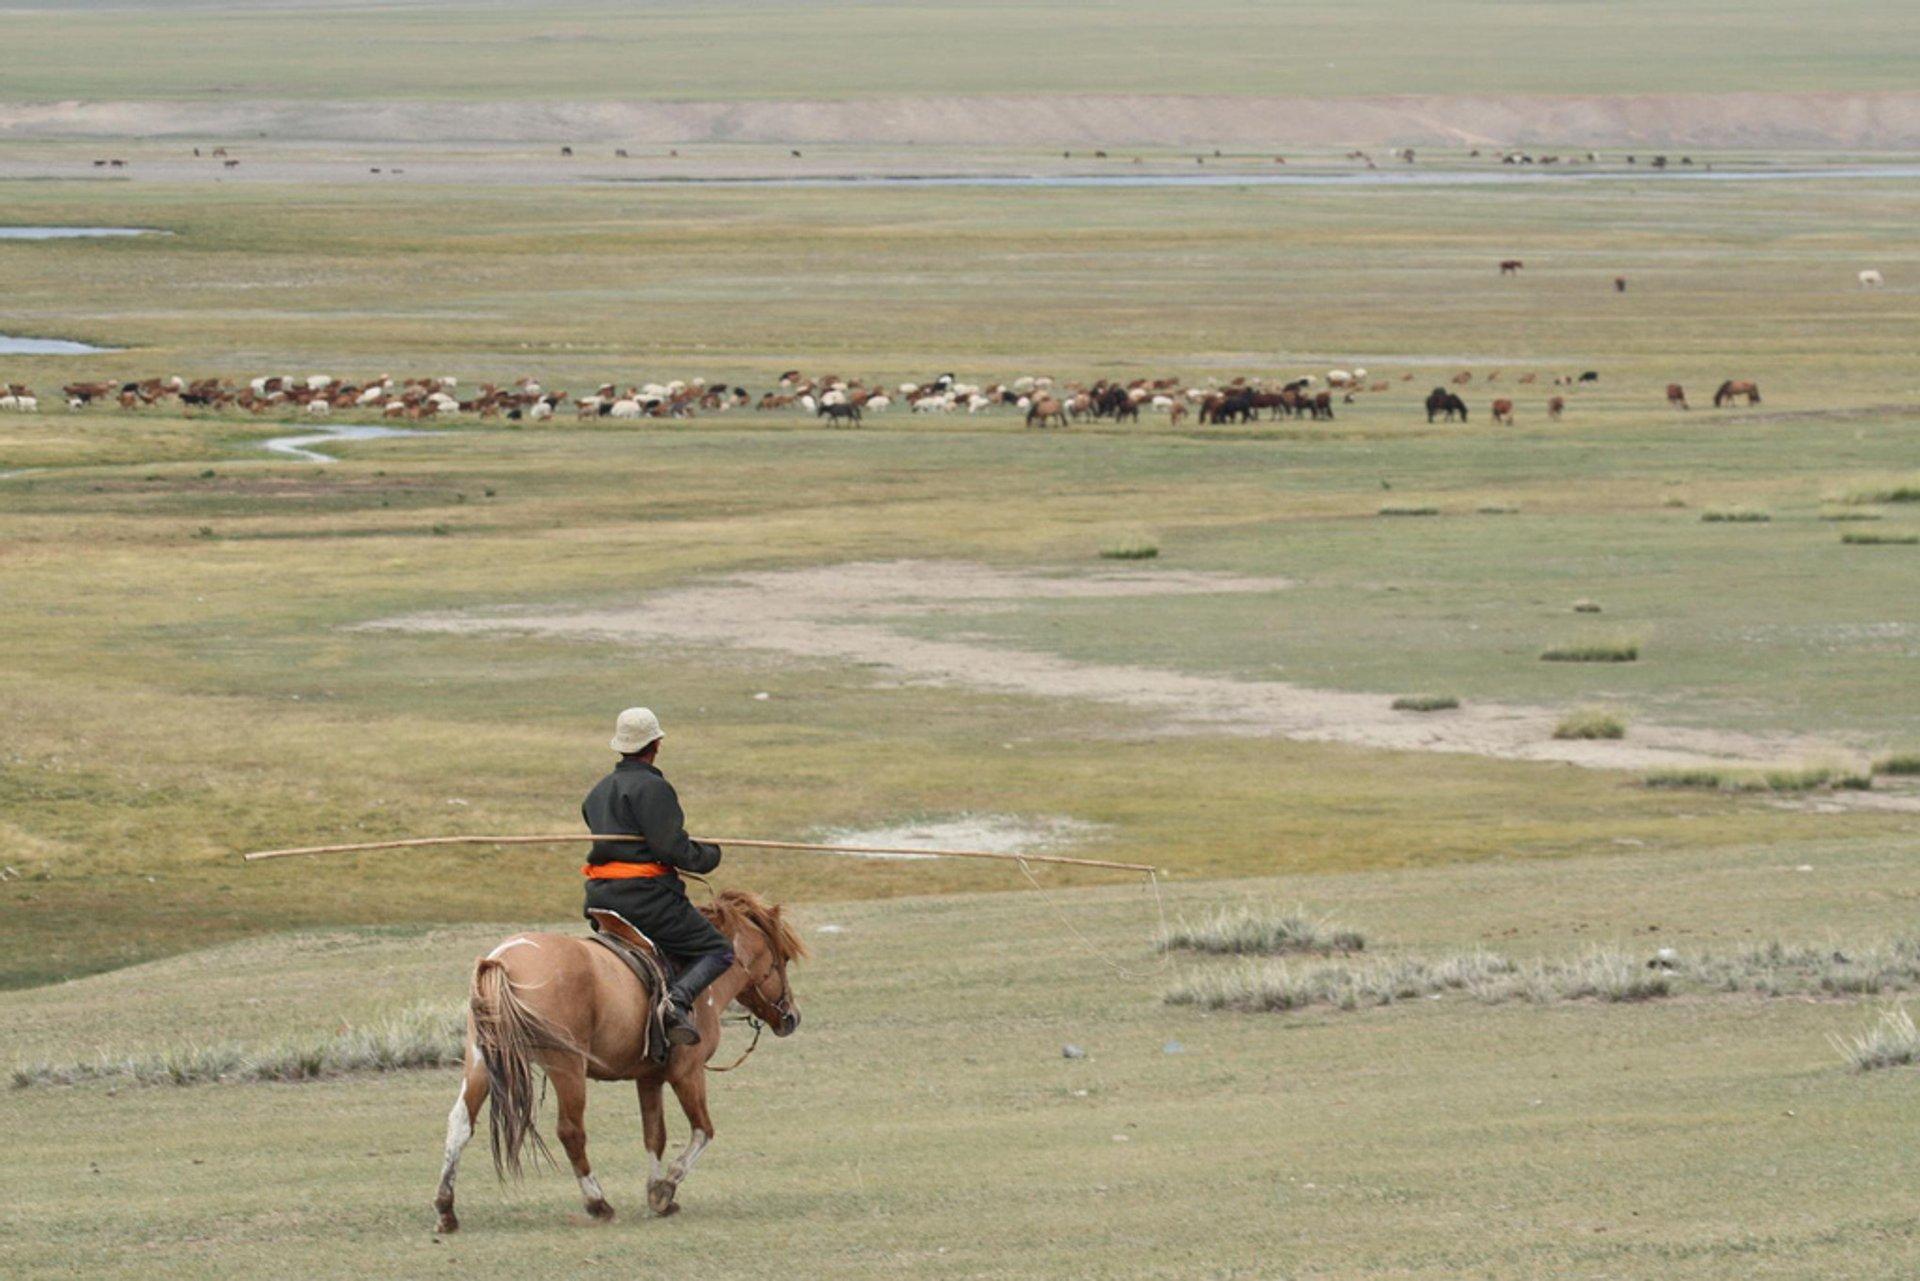 Mongolian cowboy herding horses 2020